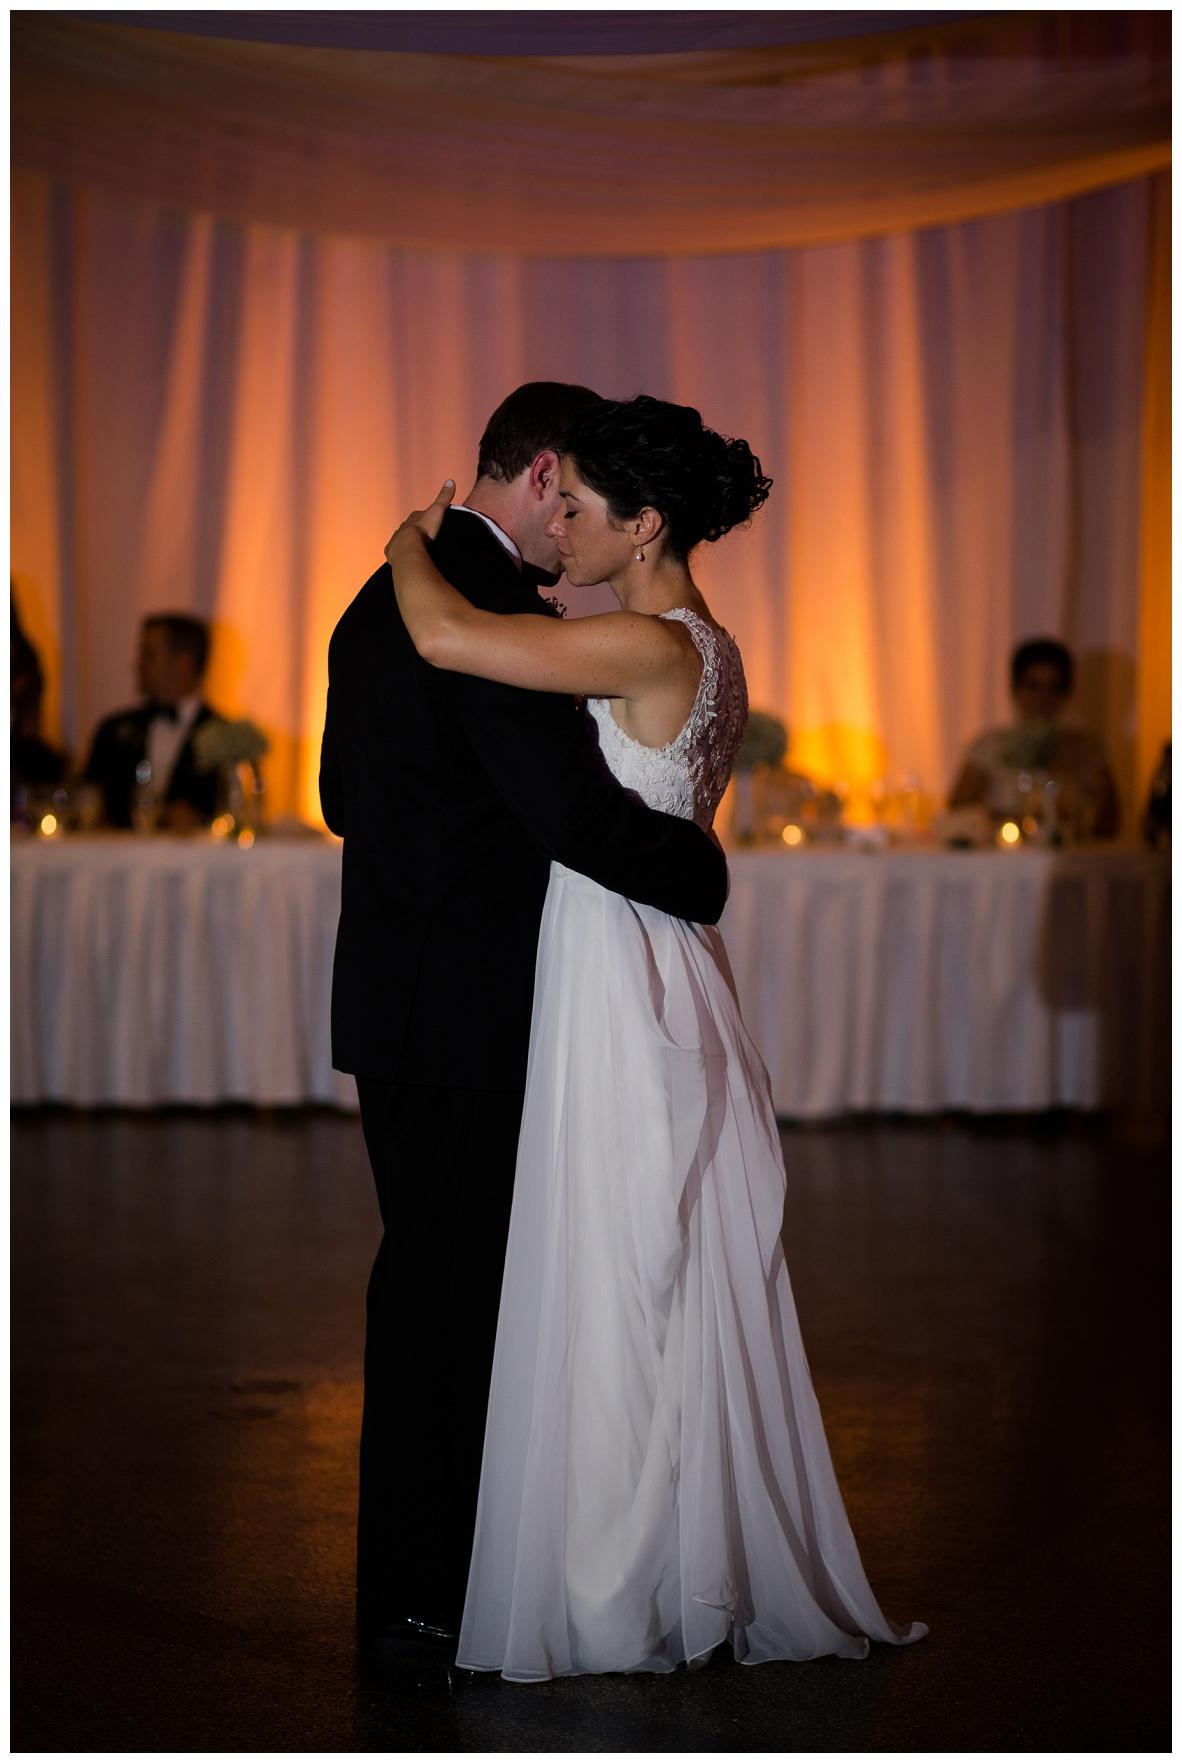 The Wedding of Danielle and Matt_0068.jpg